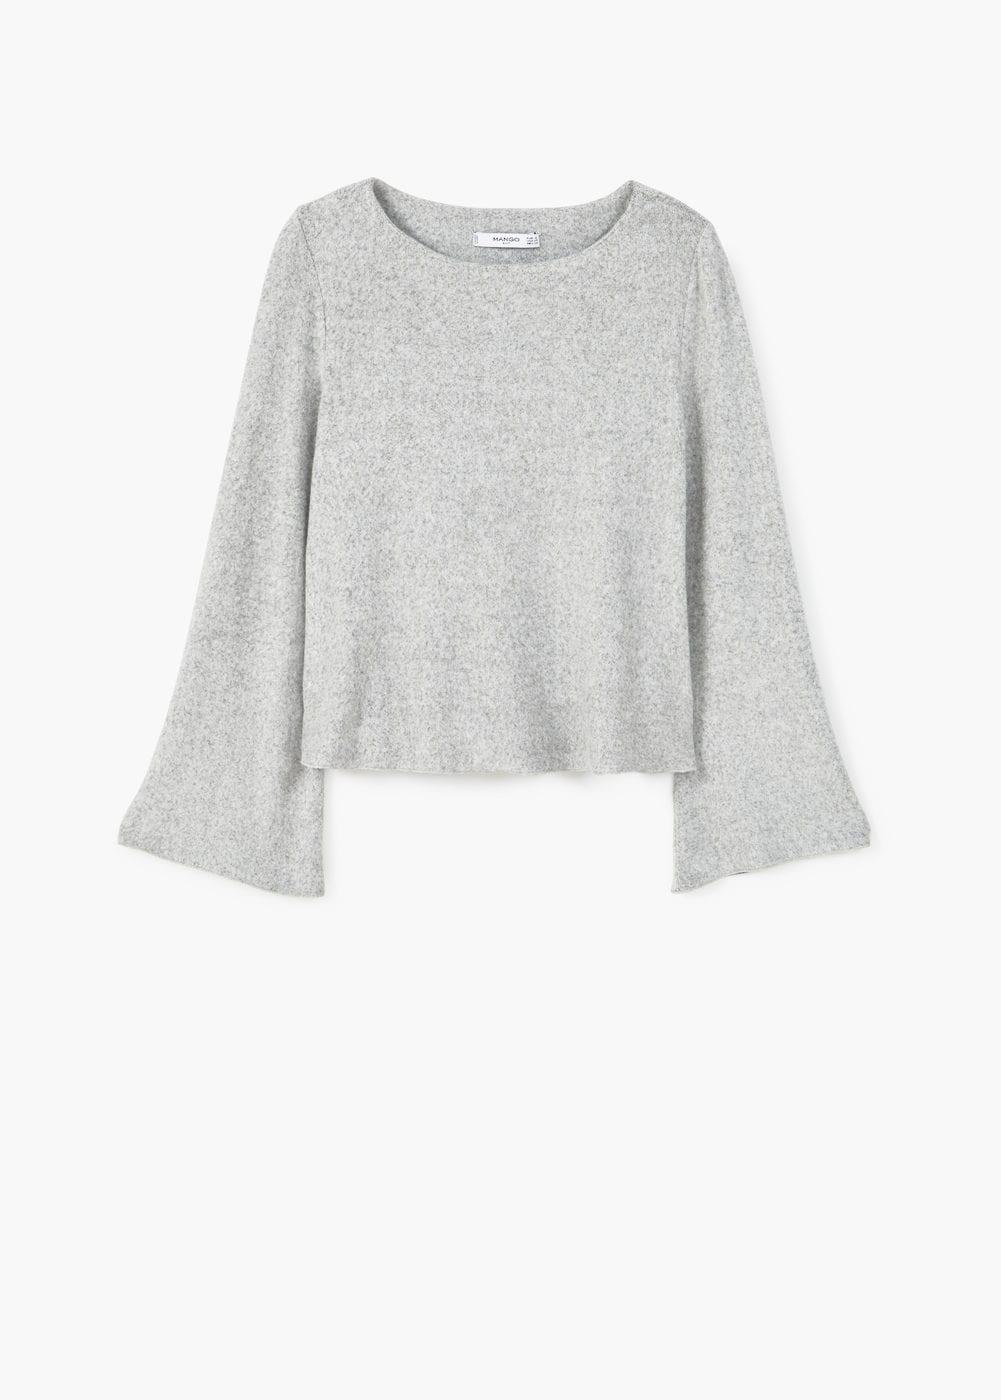 Mango Flared Sweater $39.99